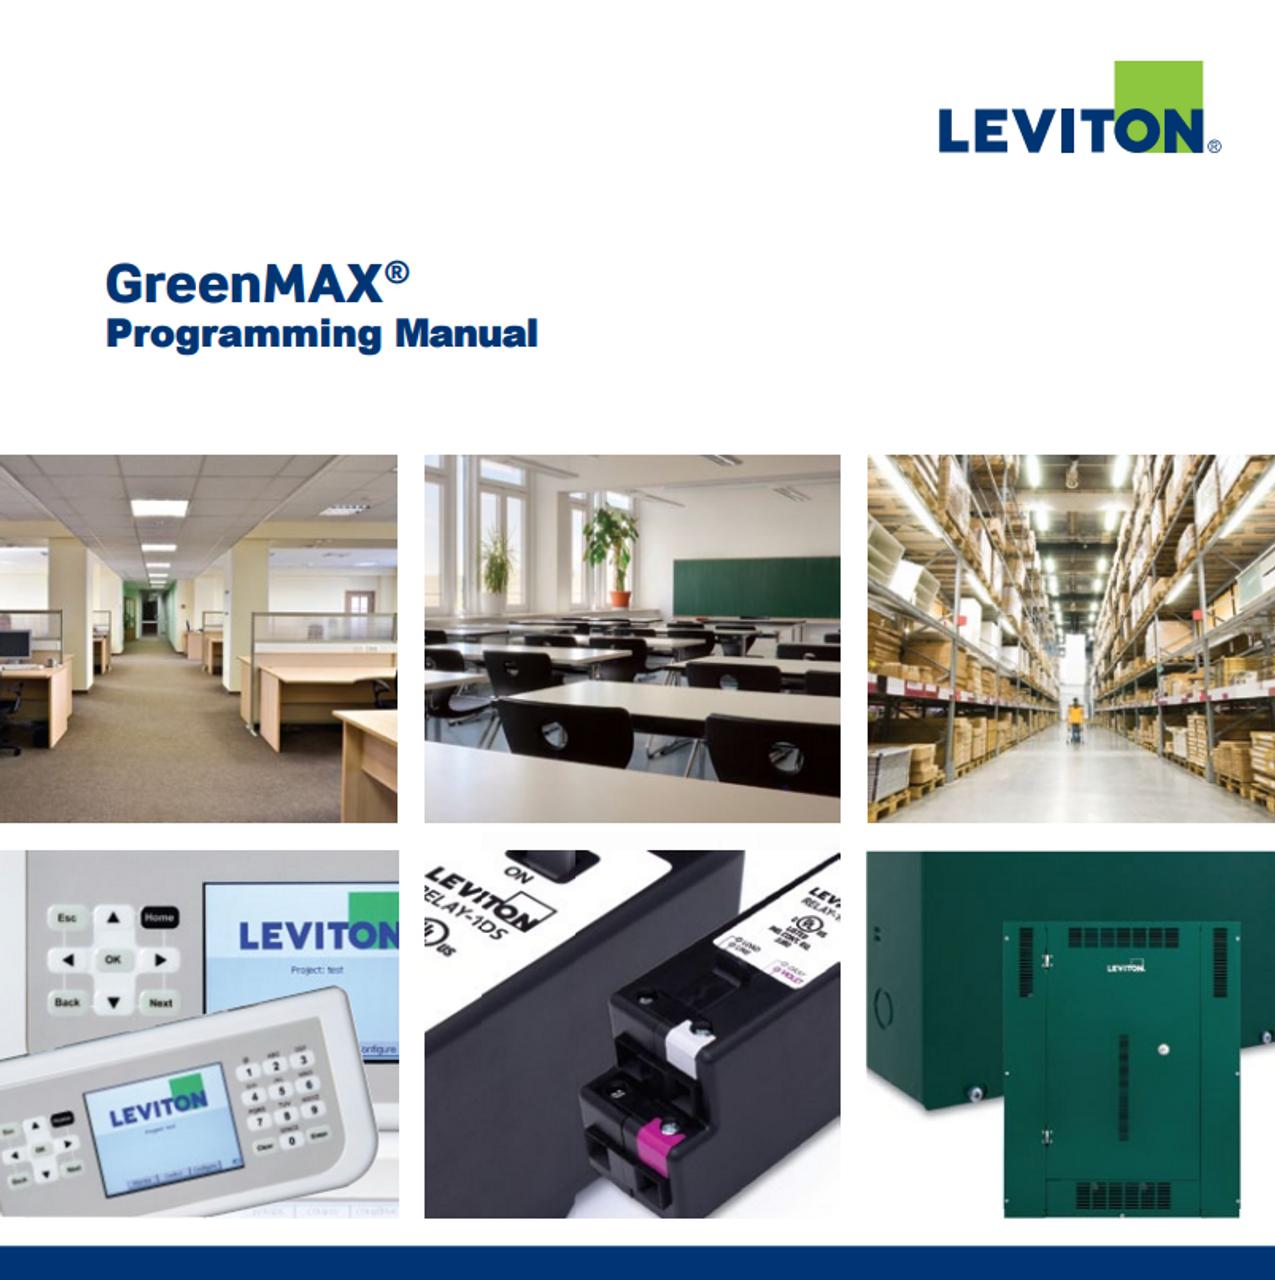 Leviton Greenmax Programming Manual - GoKnight